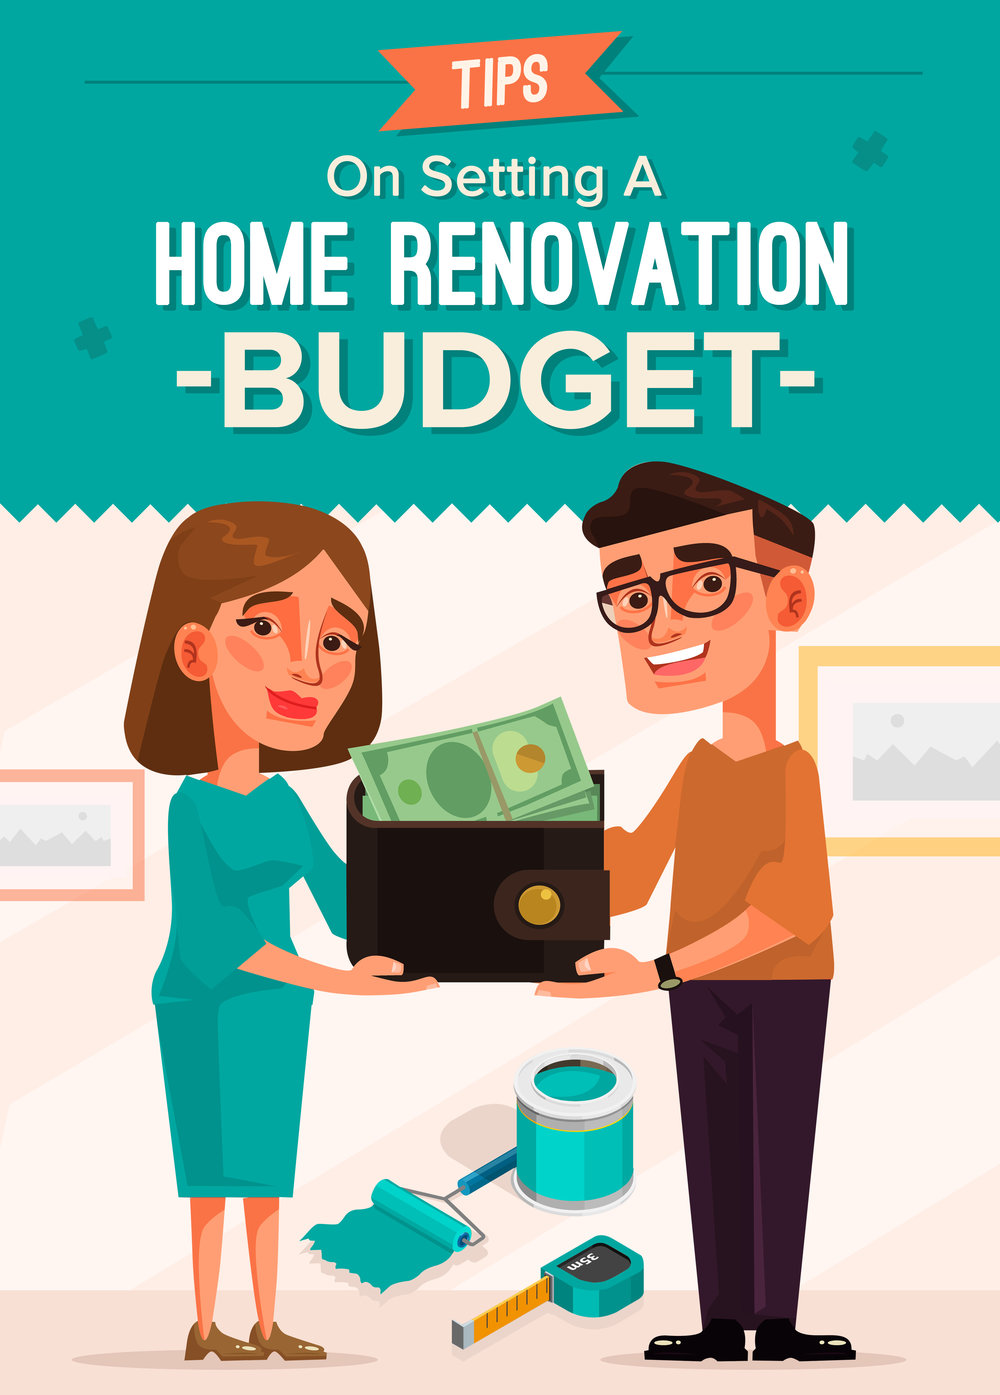 Tips On Setting A Home Renovation Budget